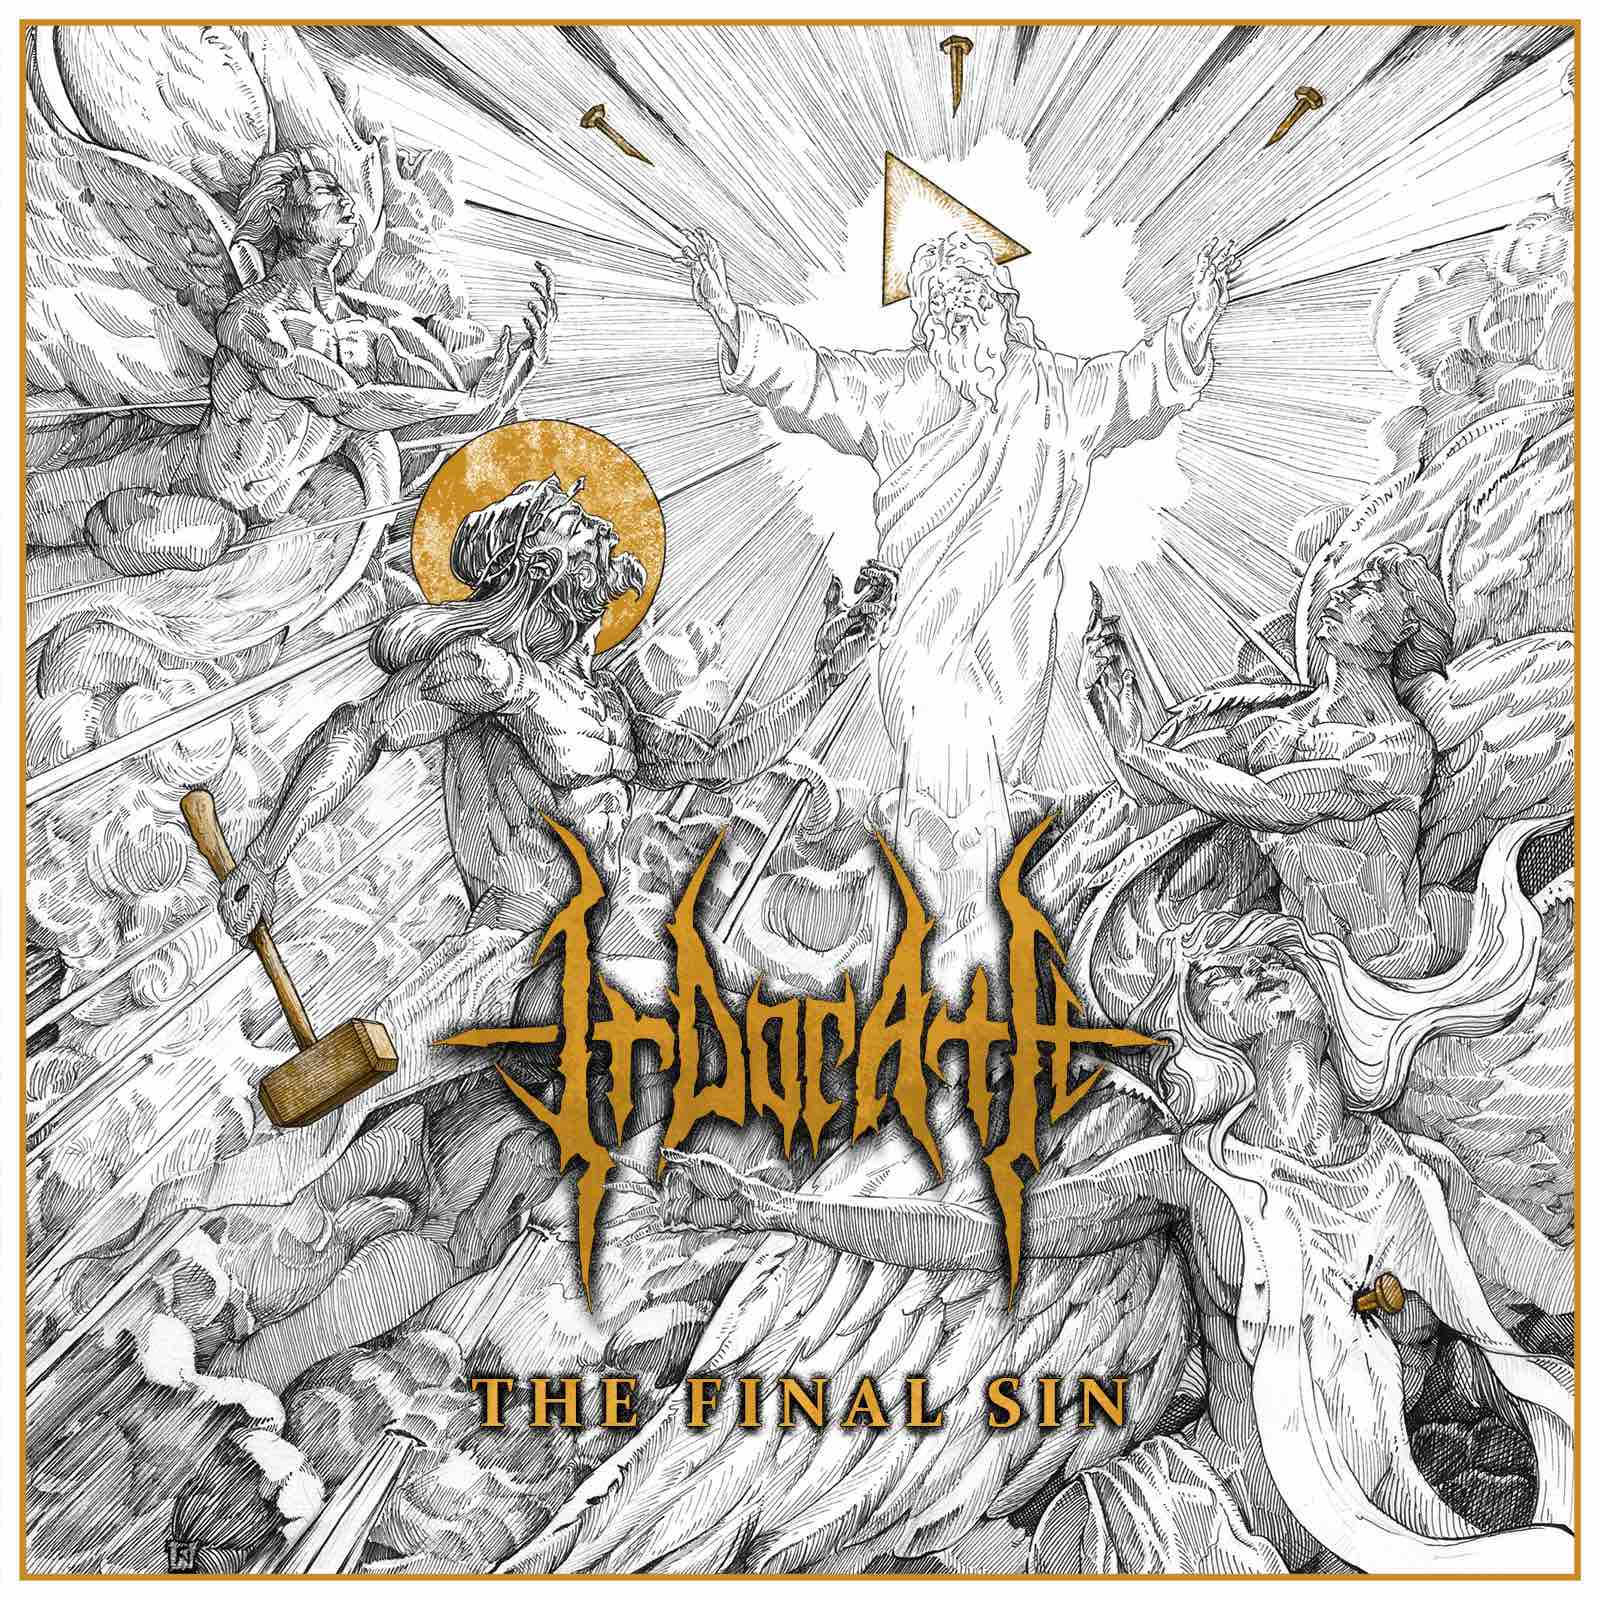 Irdorath The final sin